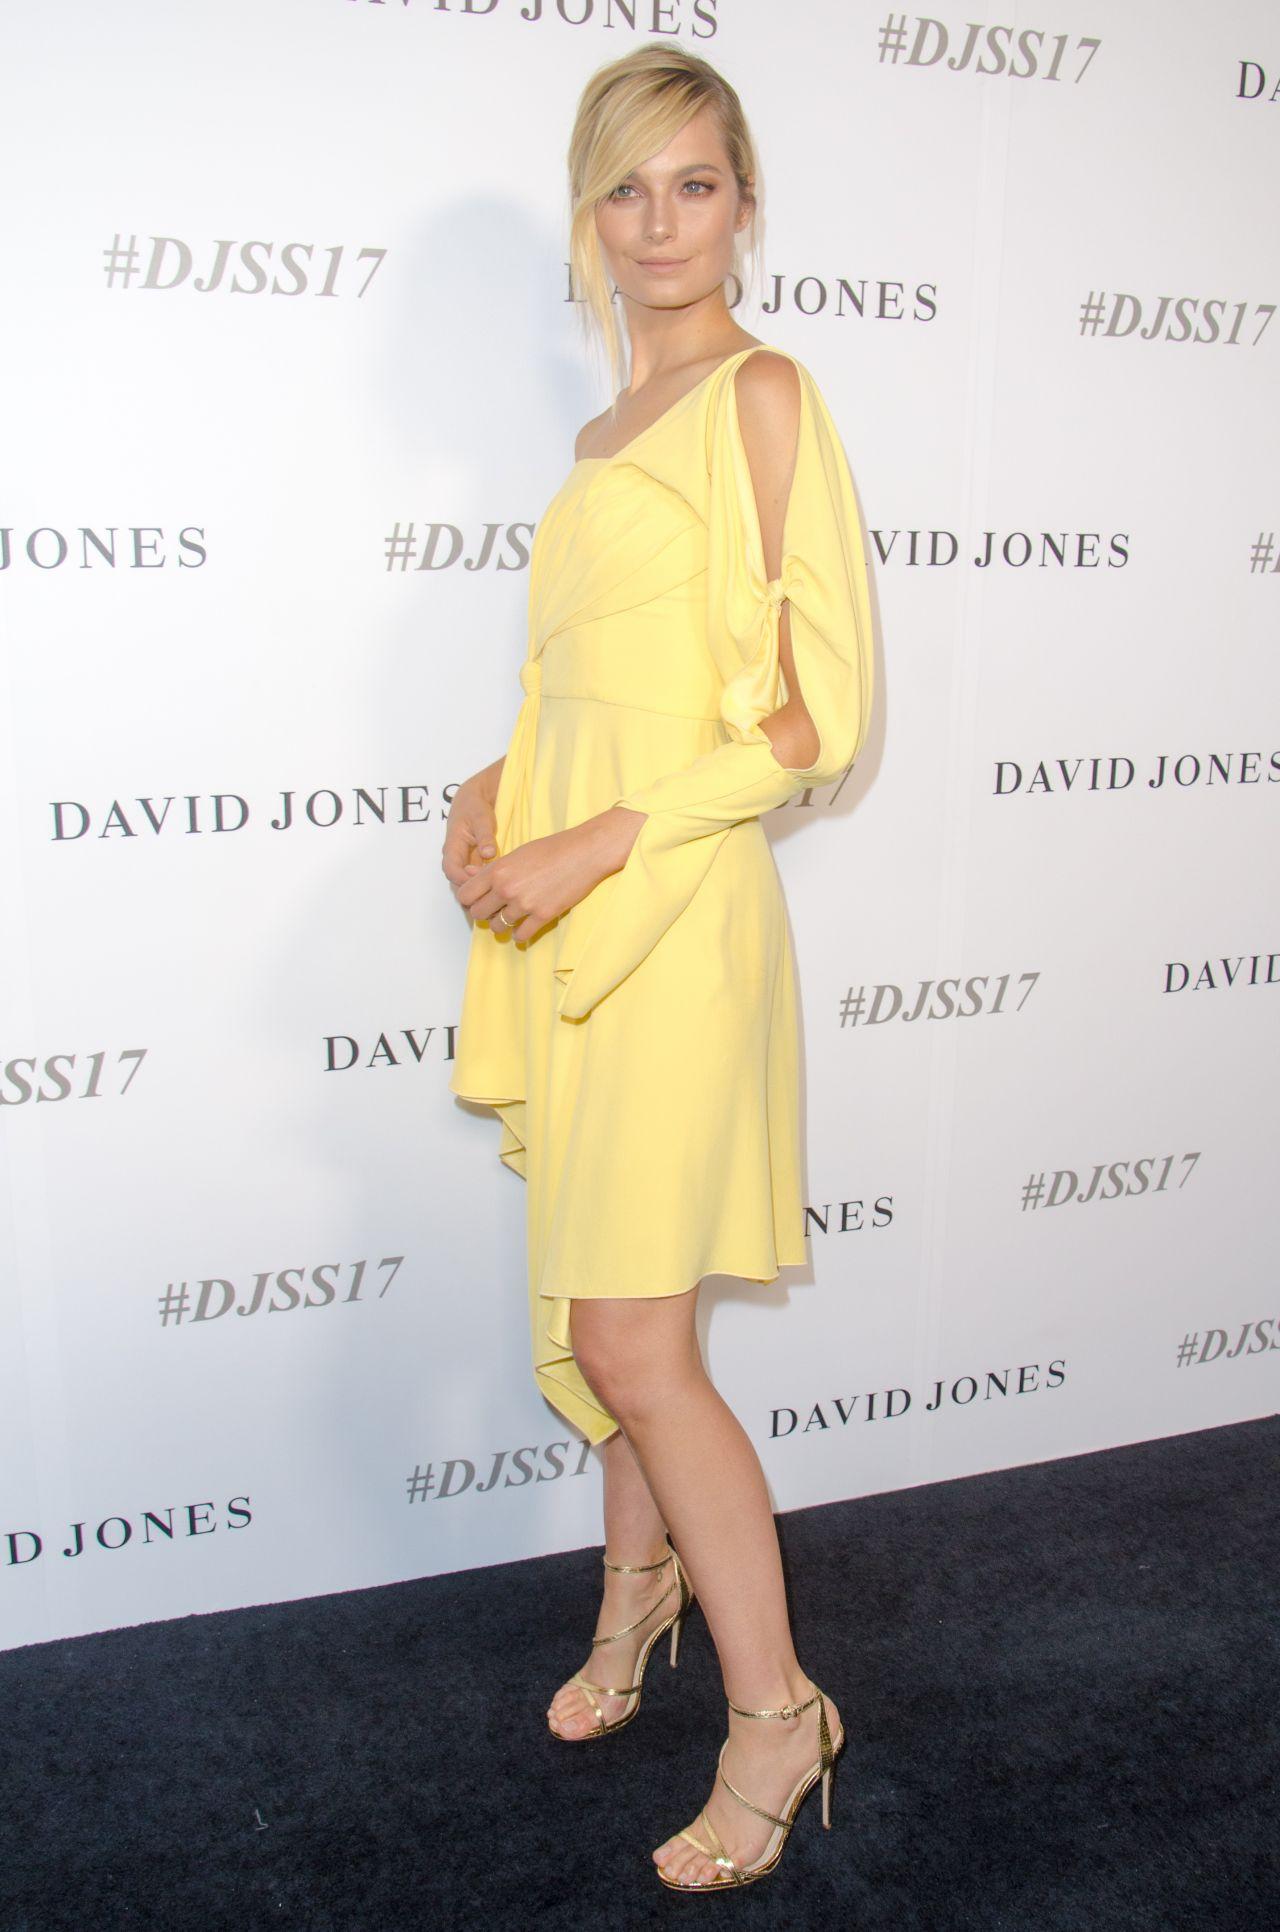 43aa2bce5756 Bridget Malcolm – David Jones Fashion Show in Sydney, Australia 08/09/2017